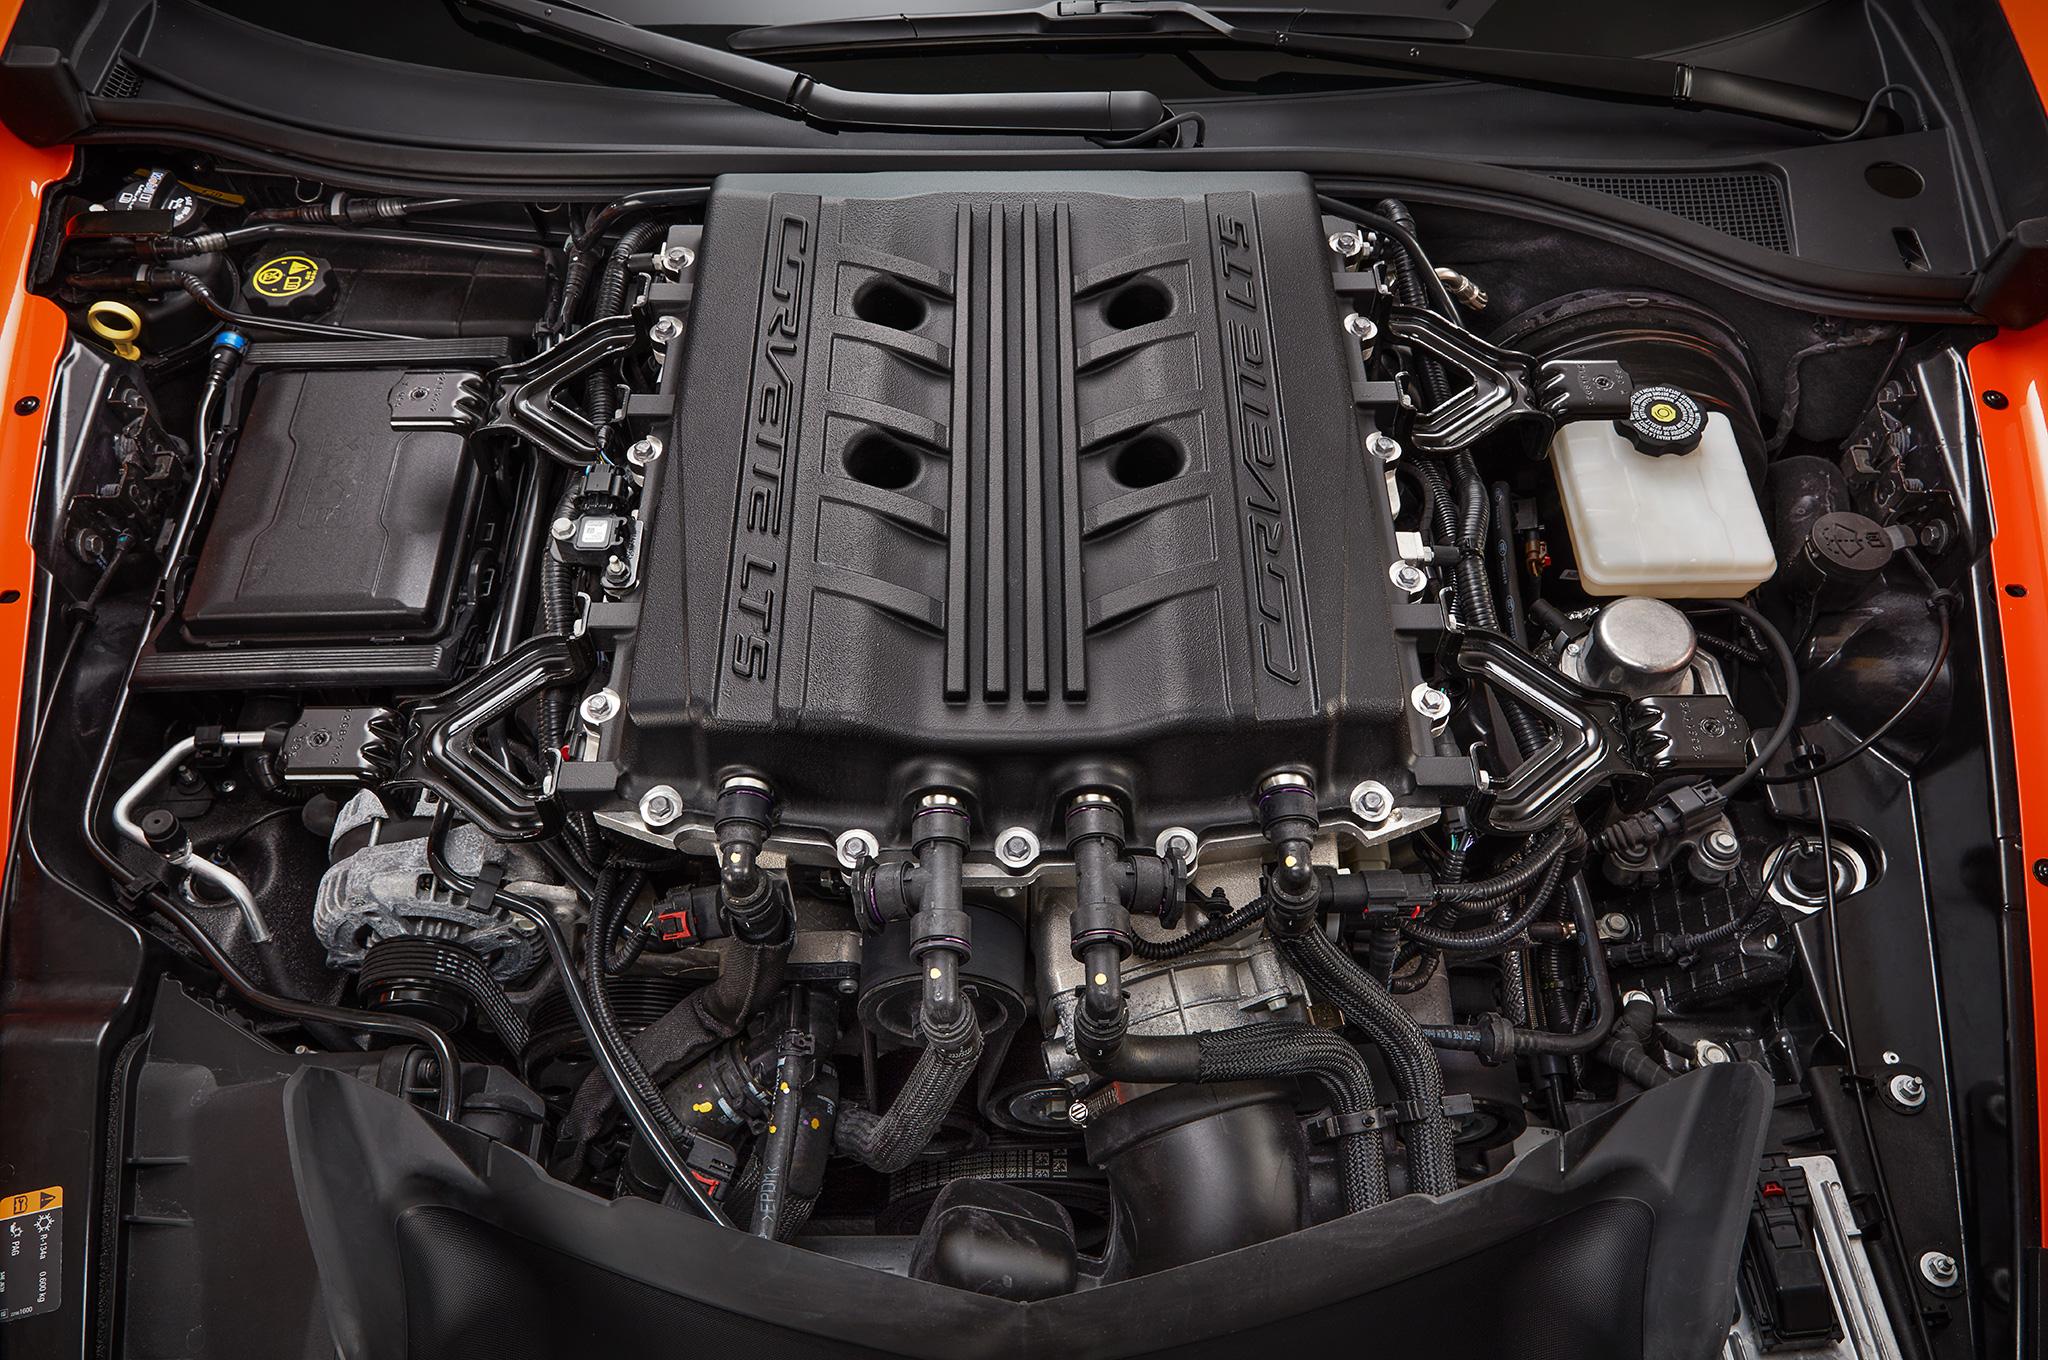 2019 Corvette ZR1 LT5 Engine